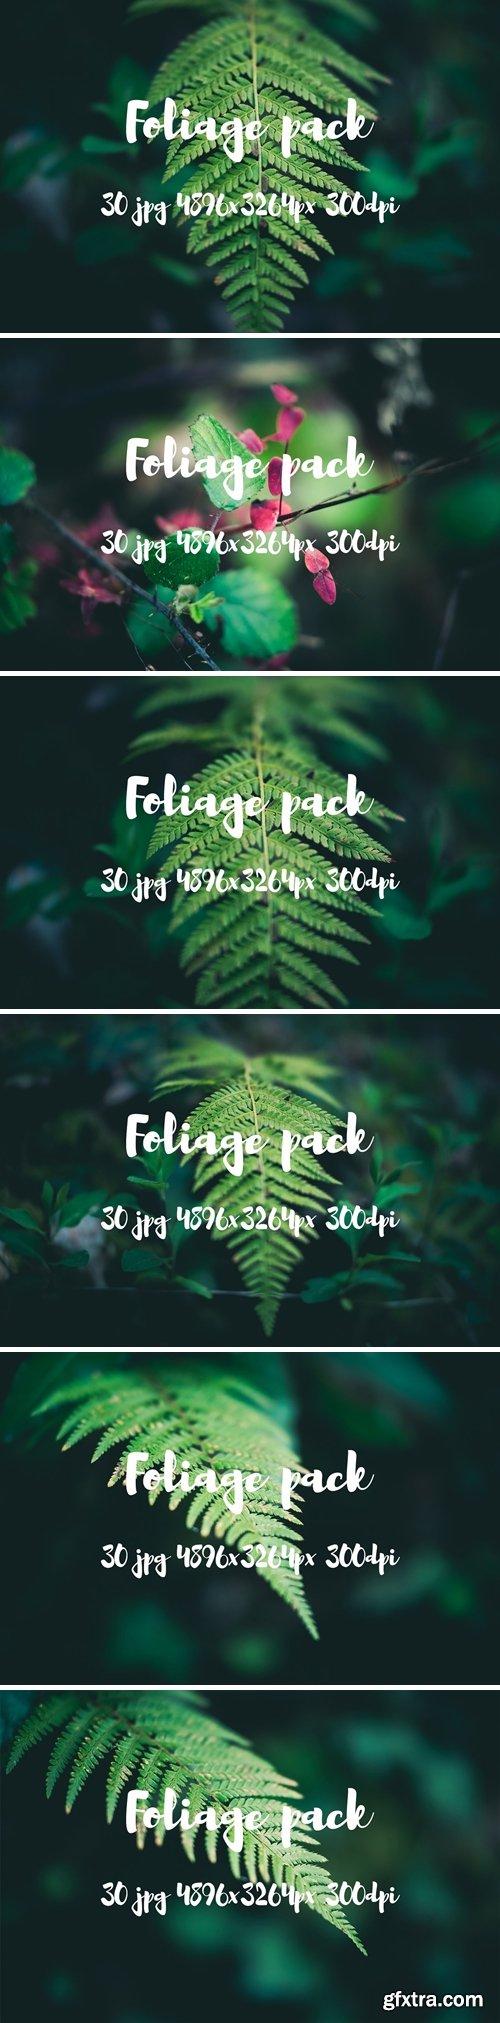 CM - Foliage pack 2477731